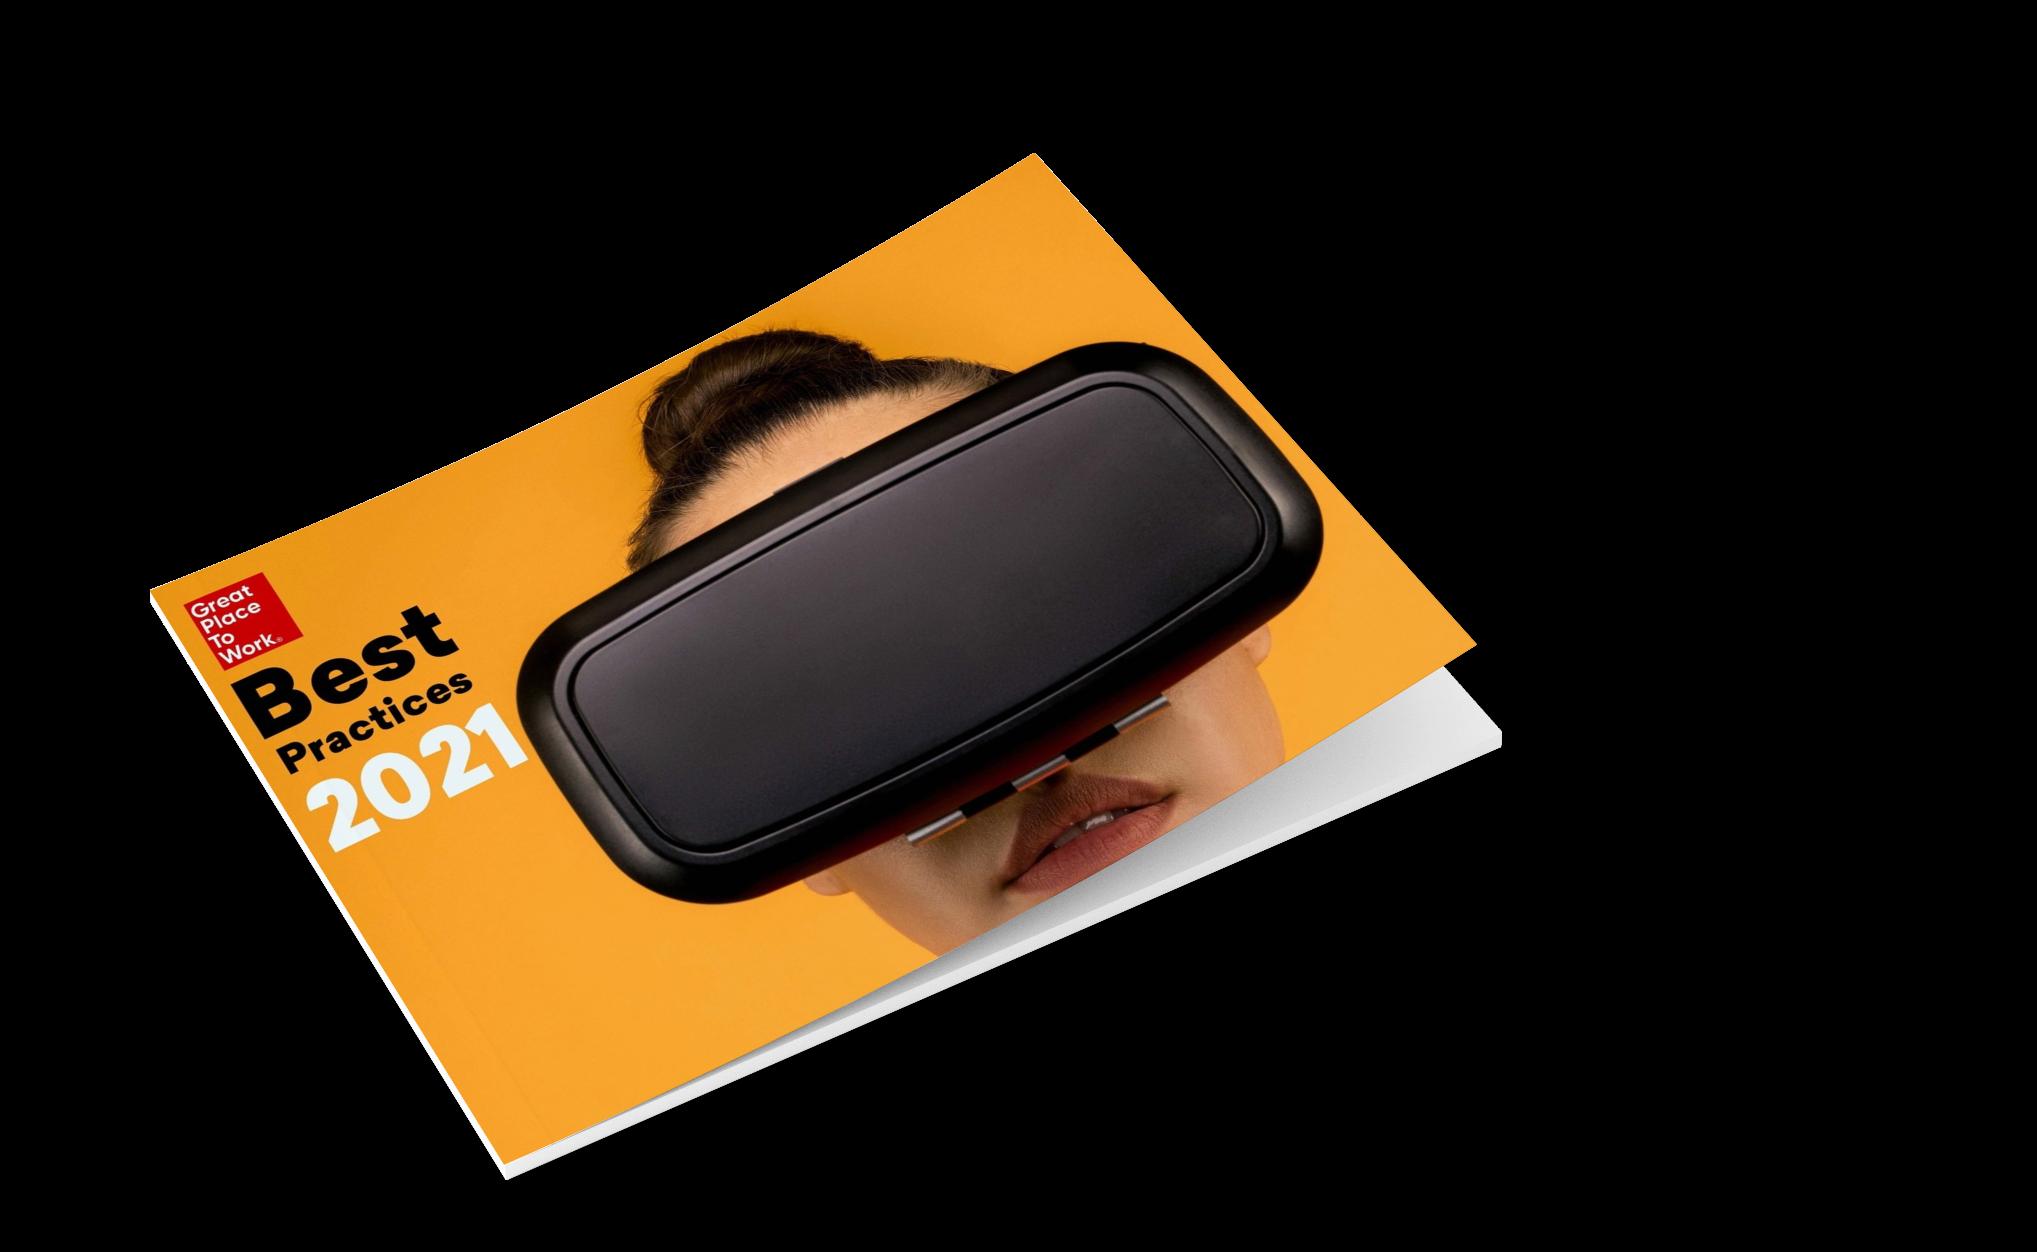 GPTW - Best Practices 2021 - 3D Cover